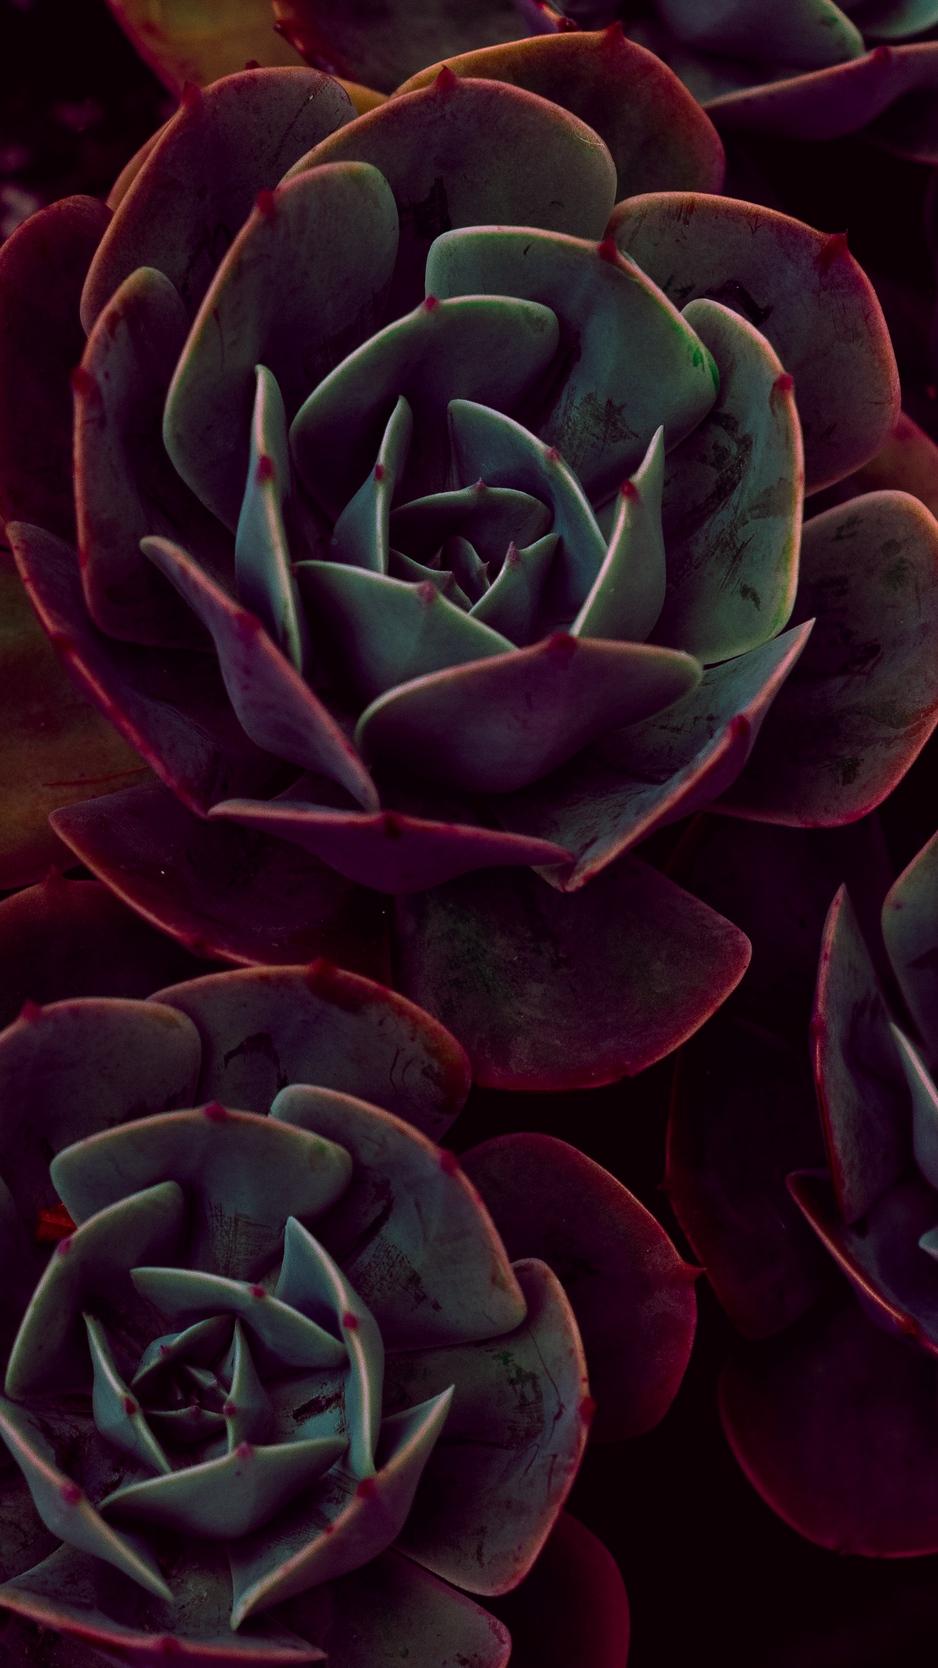 Wallpaper Echeveria, Succulents, Houseplant, Leaves - Dark Iphone X Wallpaper Succulent , HD Wallpaper & Backgrounds